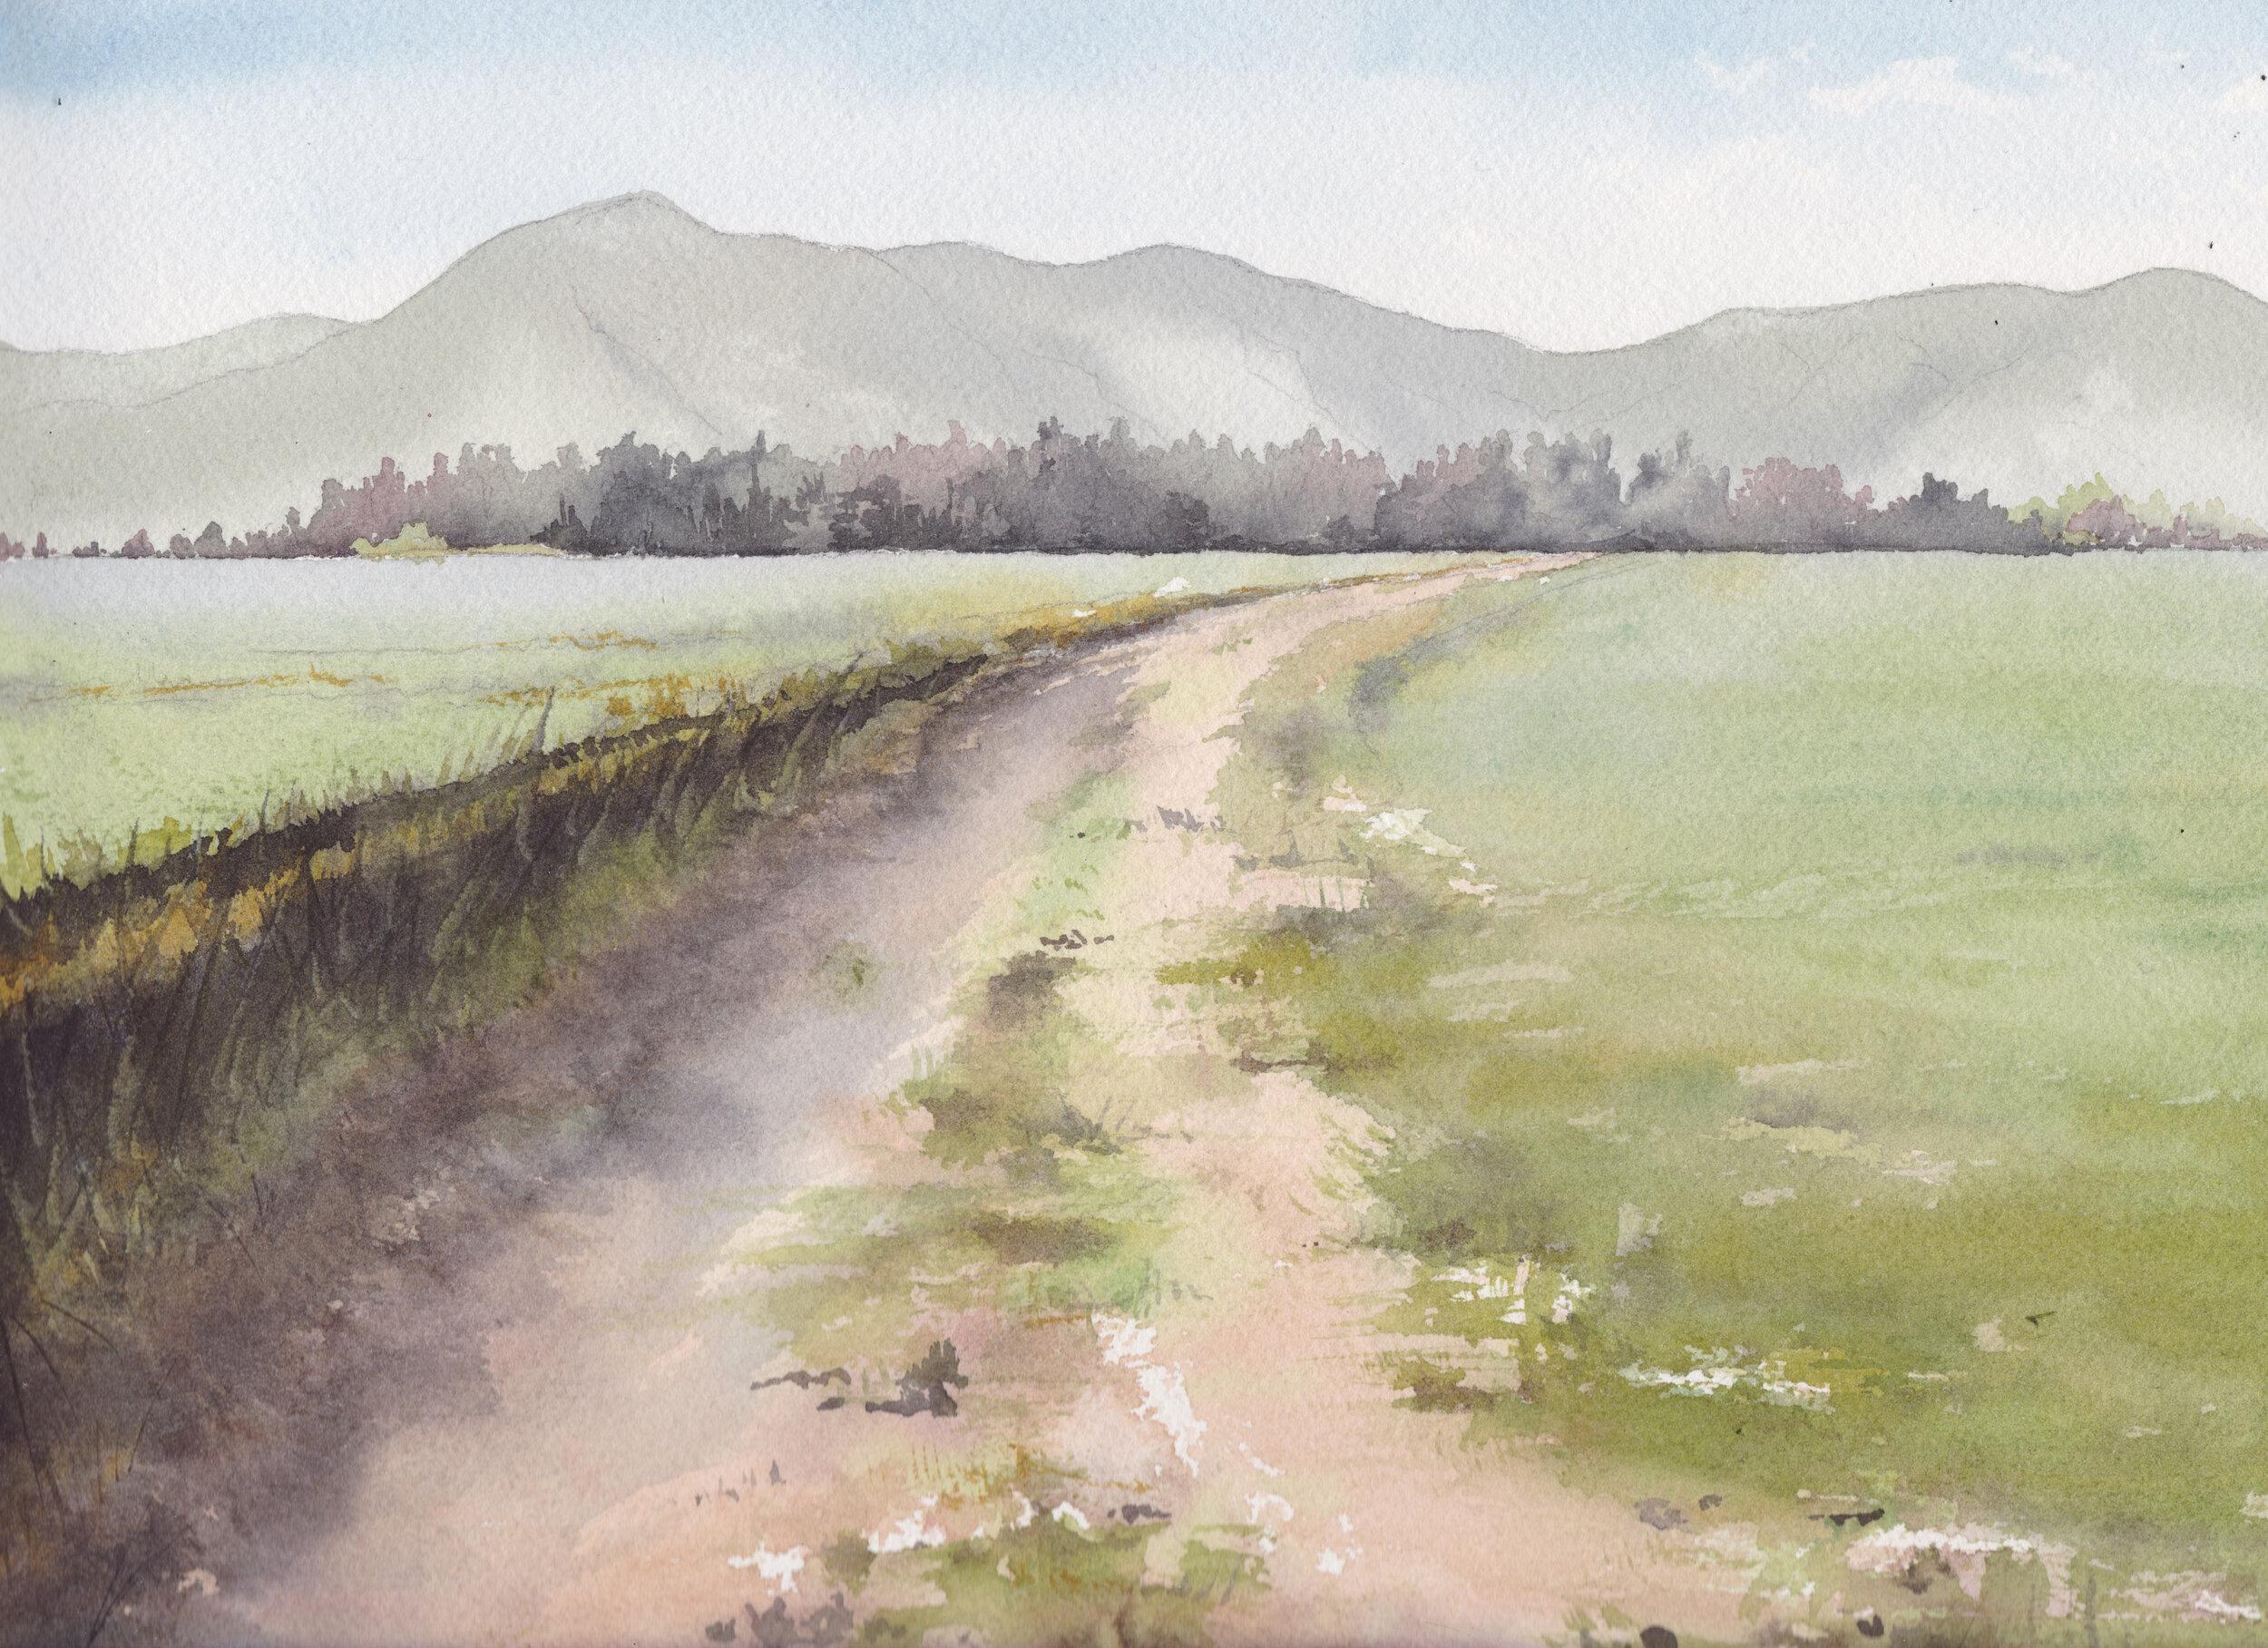 """Potreros Paniahue"", V Región, Chile  Tamaño Lámina: 23 x 31 cms. Valor: $120.000  DISPONIBLE"